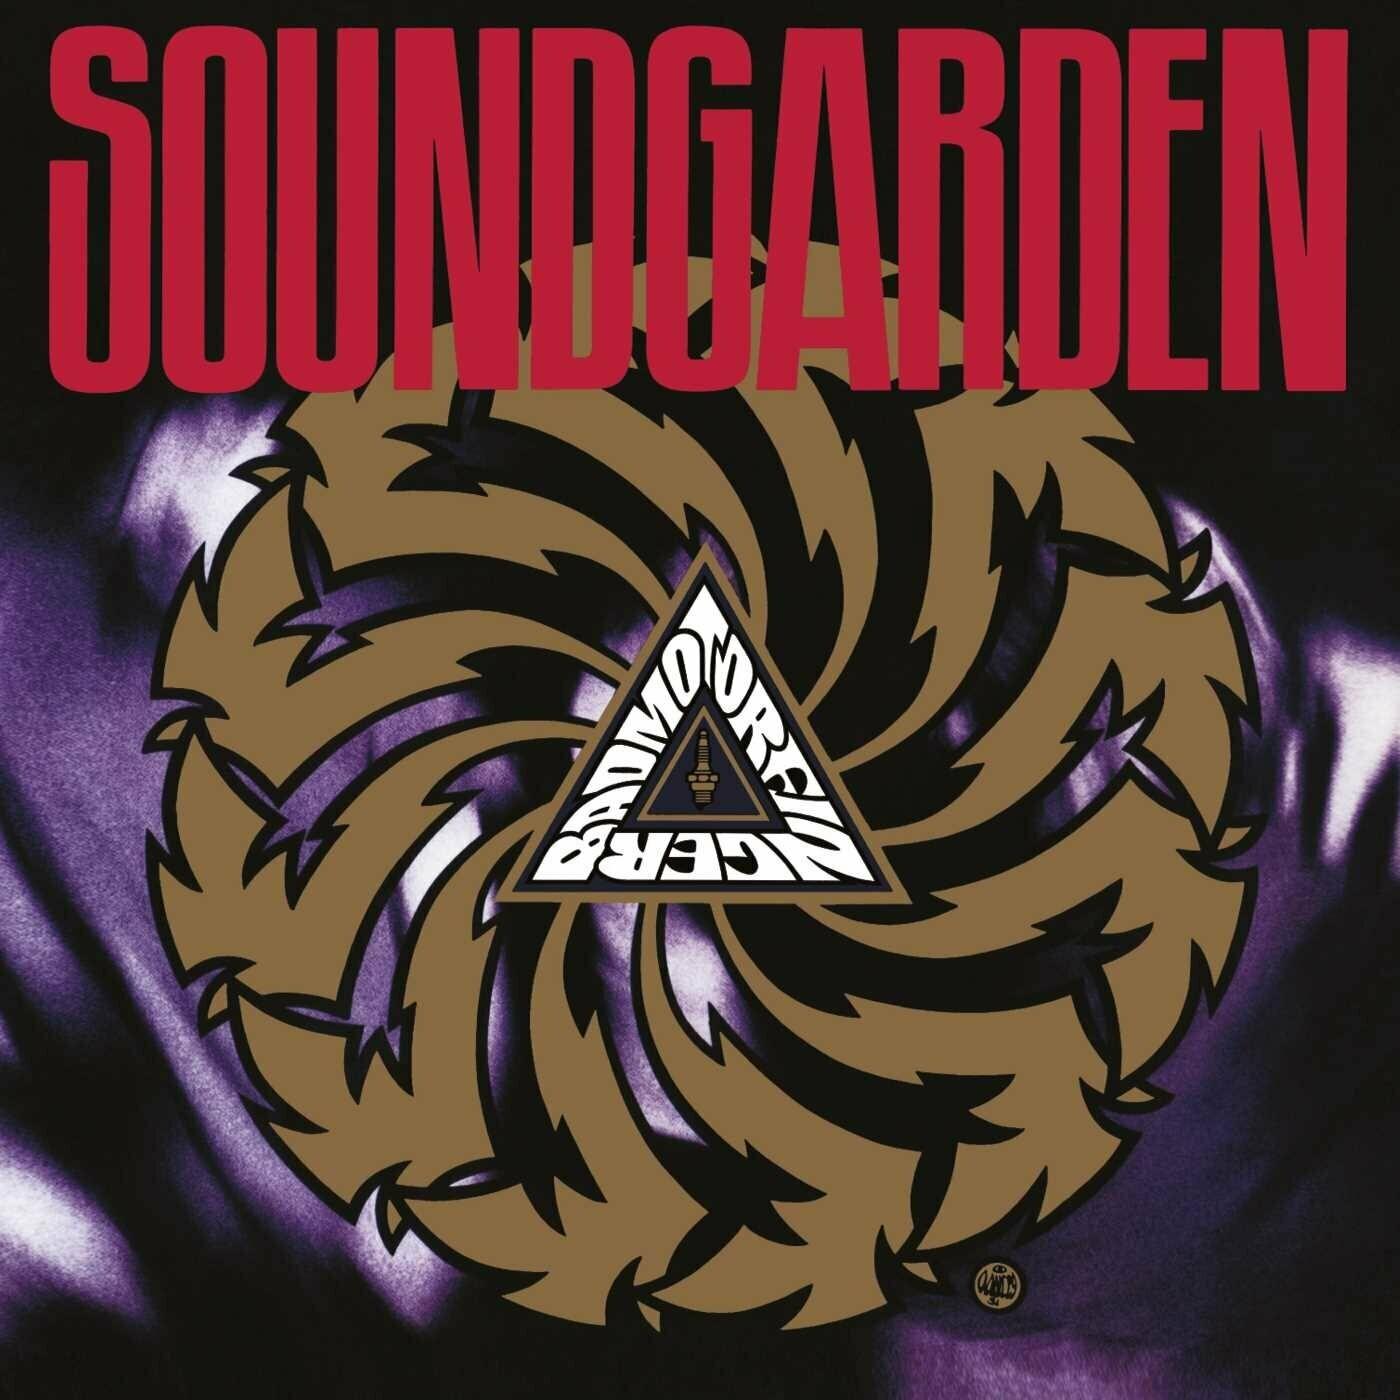 Soundgarden / Badmotorfinger (Import)